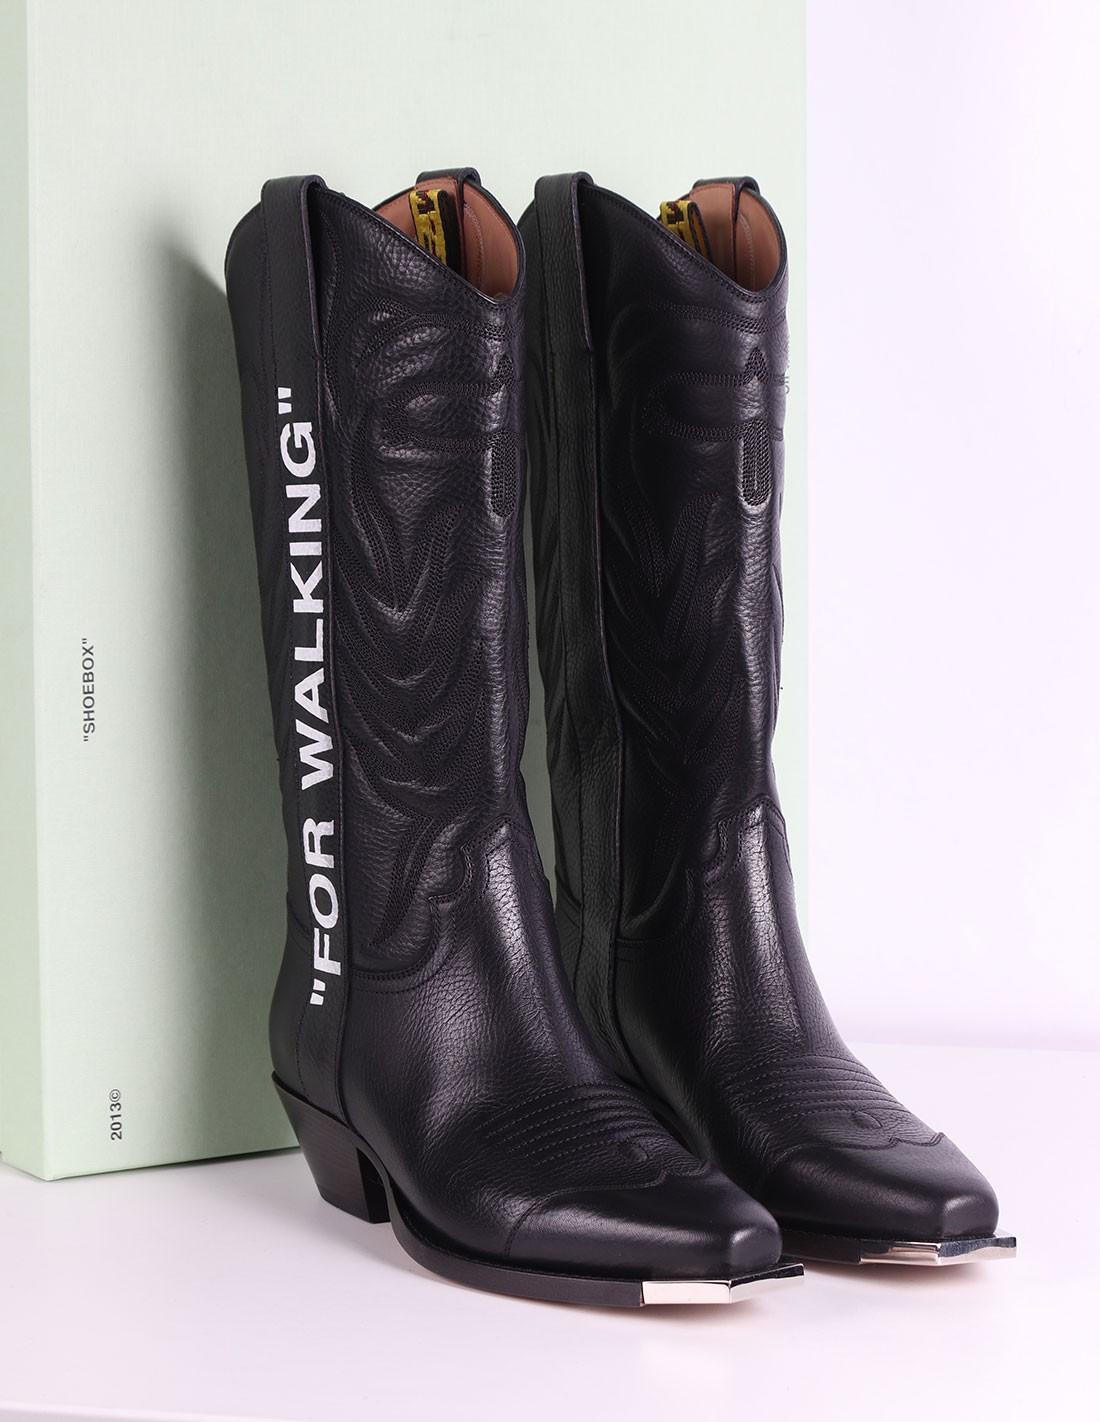 santiag black cowboy boots